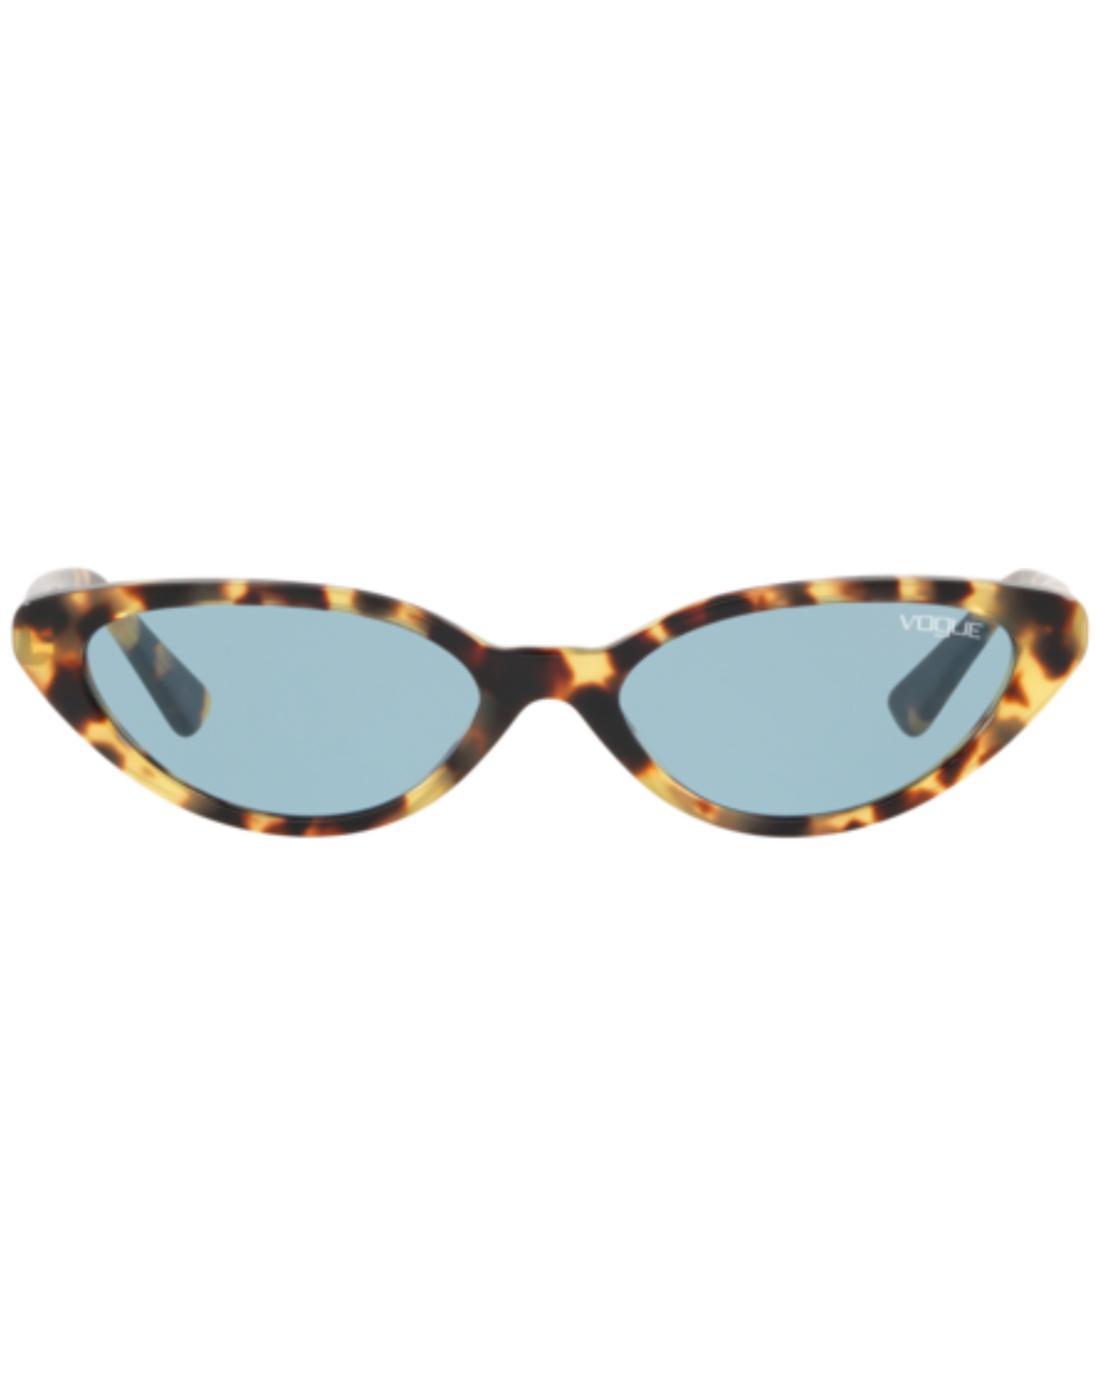 VOGUE Gigi Hadid Retro 50s Catseye Sunglasses Blue